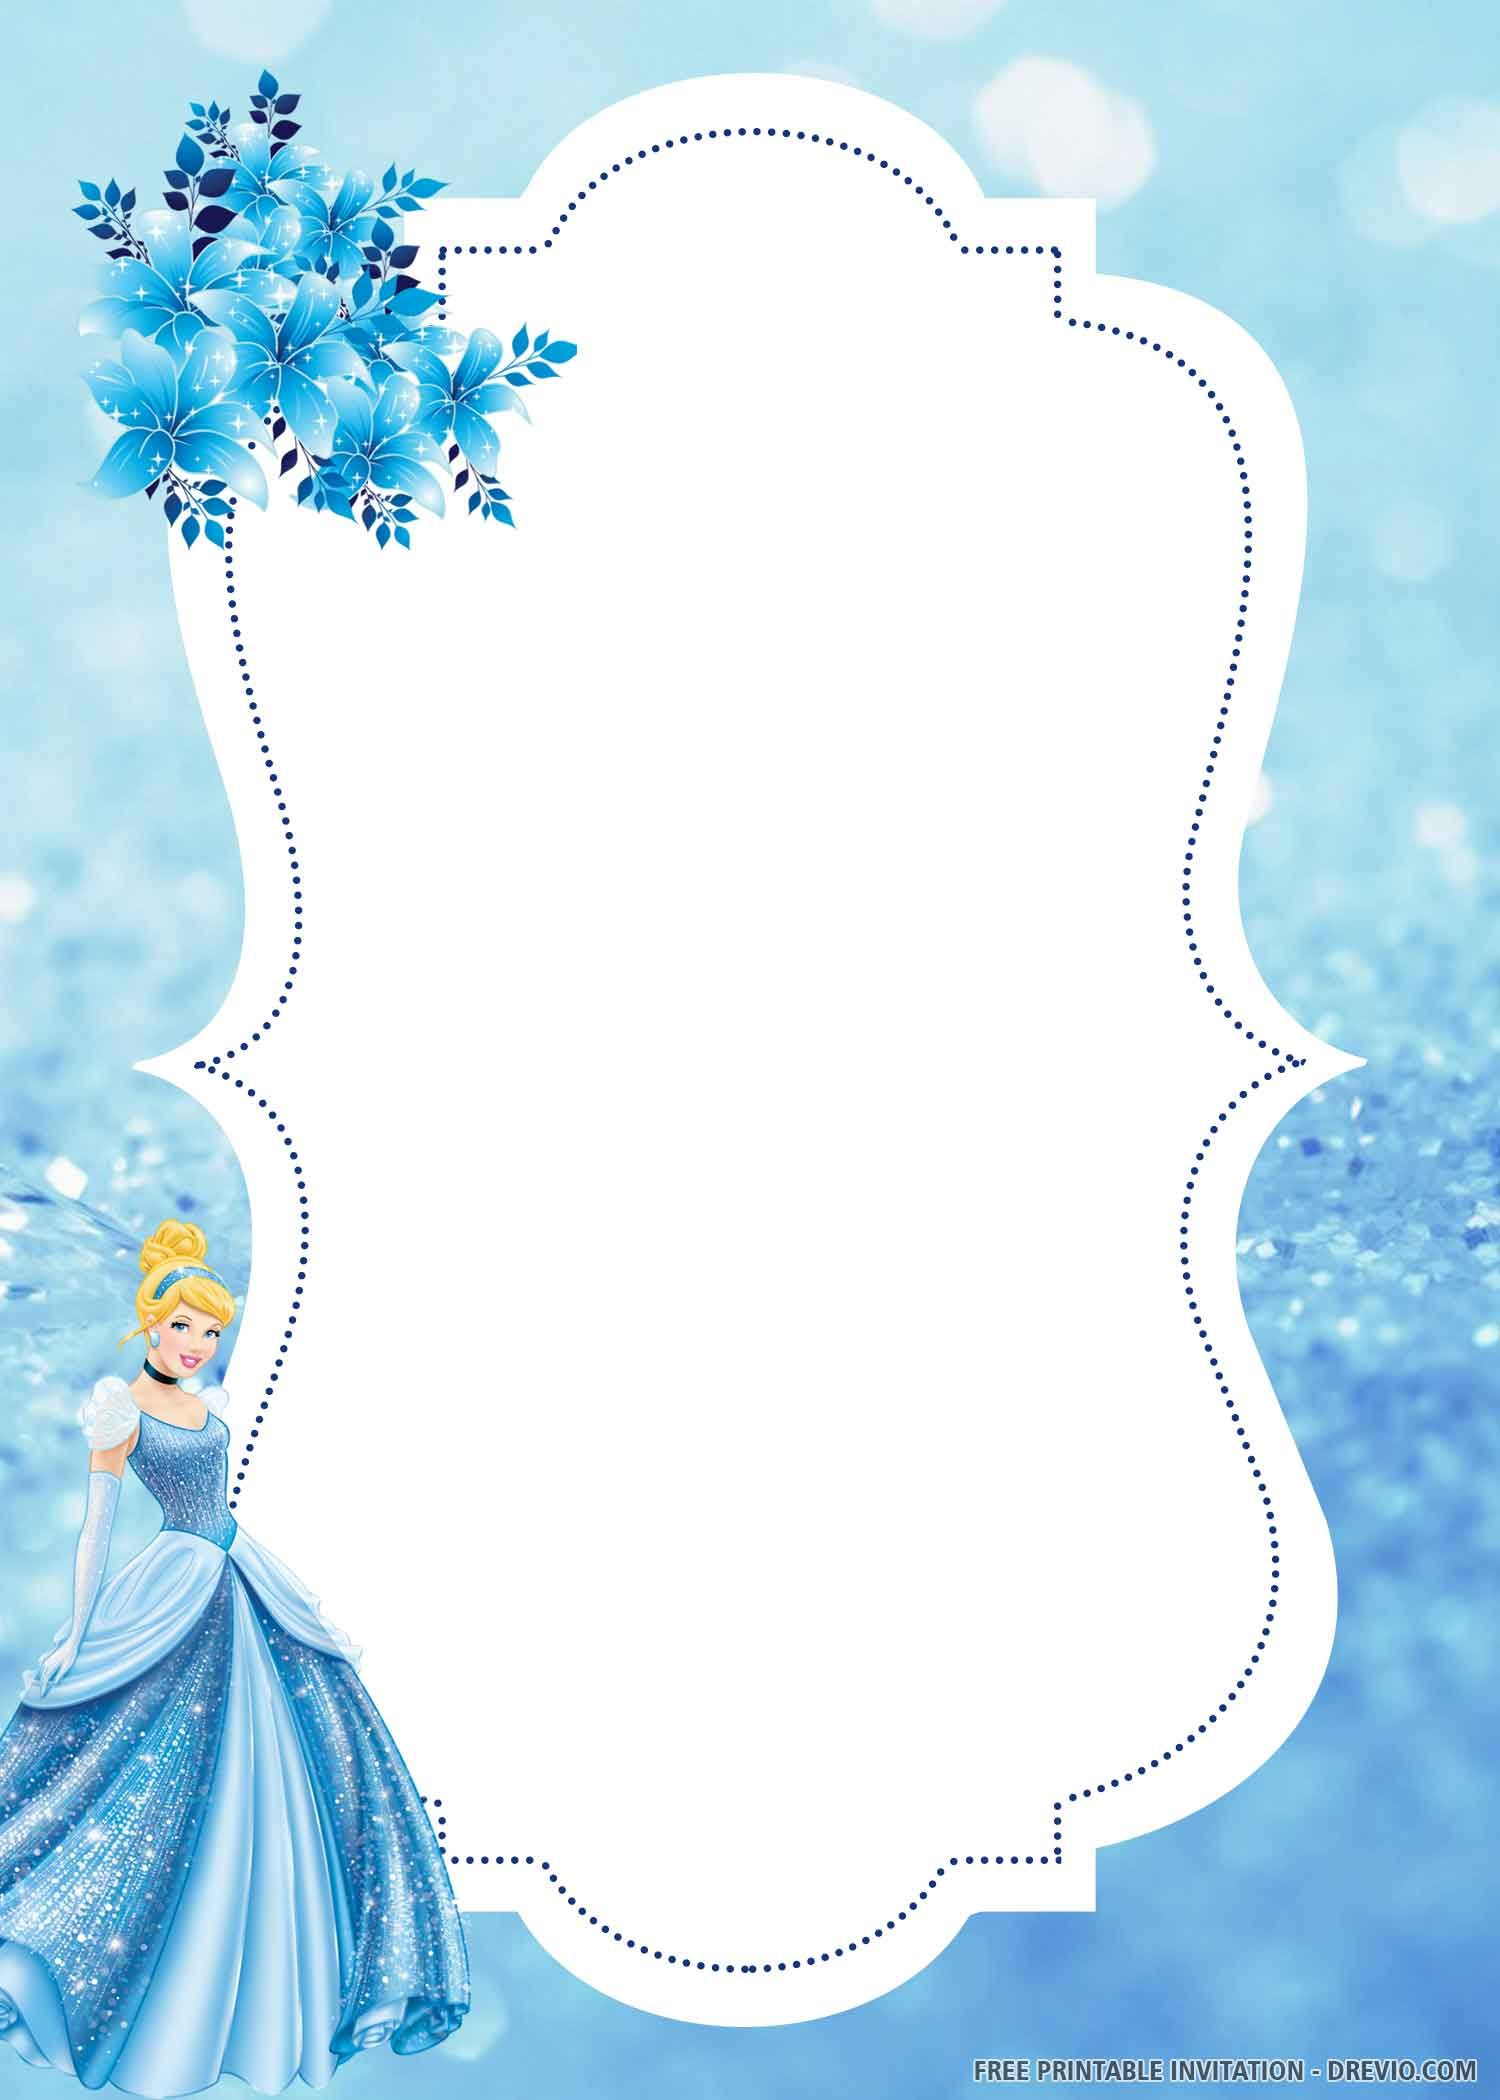 Free Printable Lovely Cinderella Birthday Invitation Templates Cinderella Birthday Invitation Cinderella Birthday Cinderella Invitations